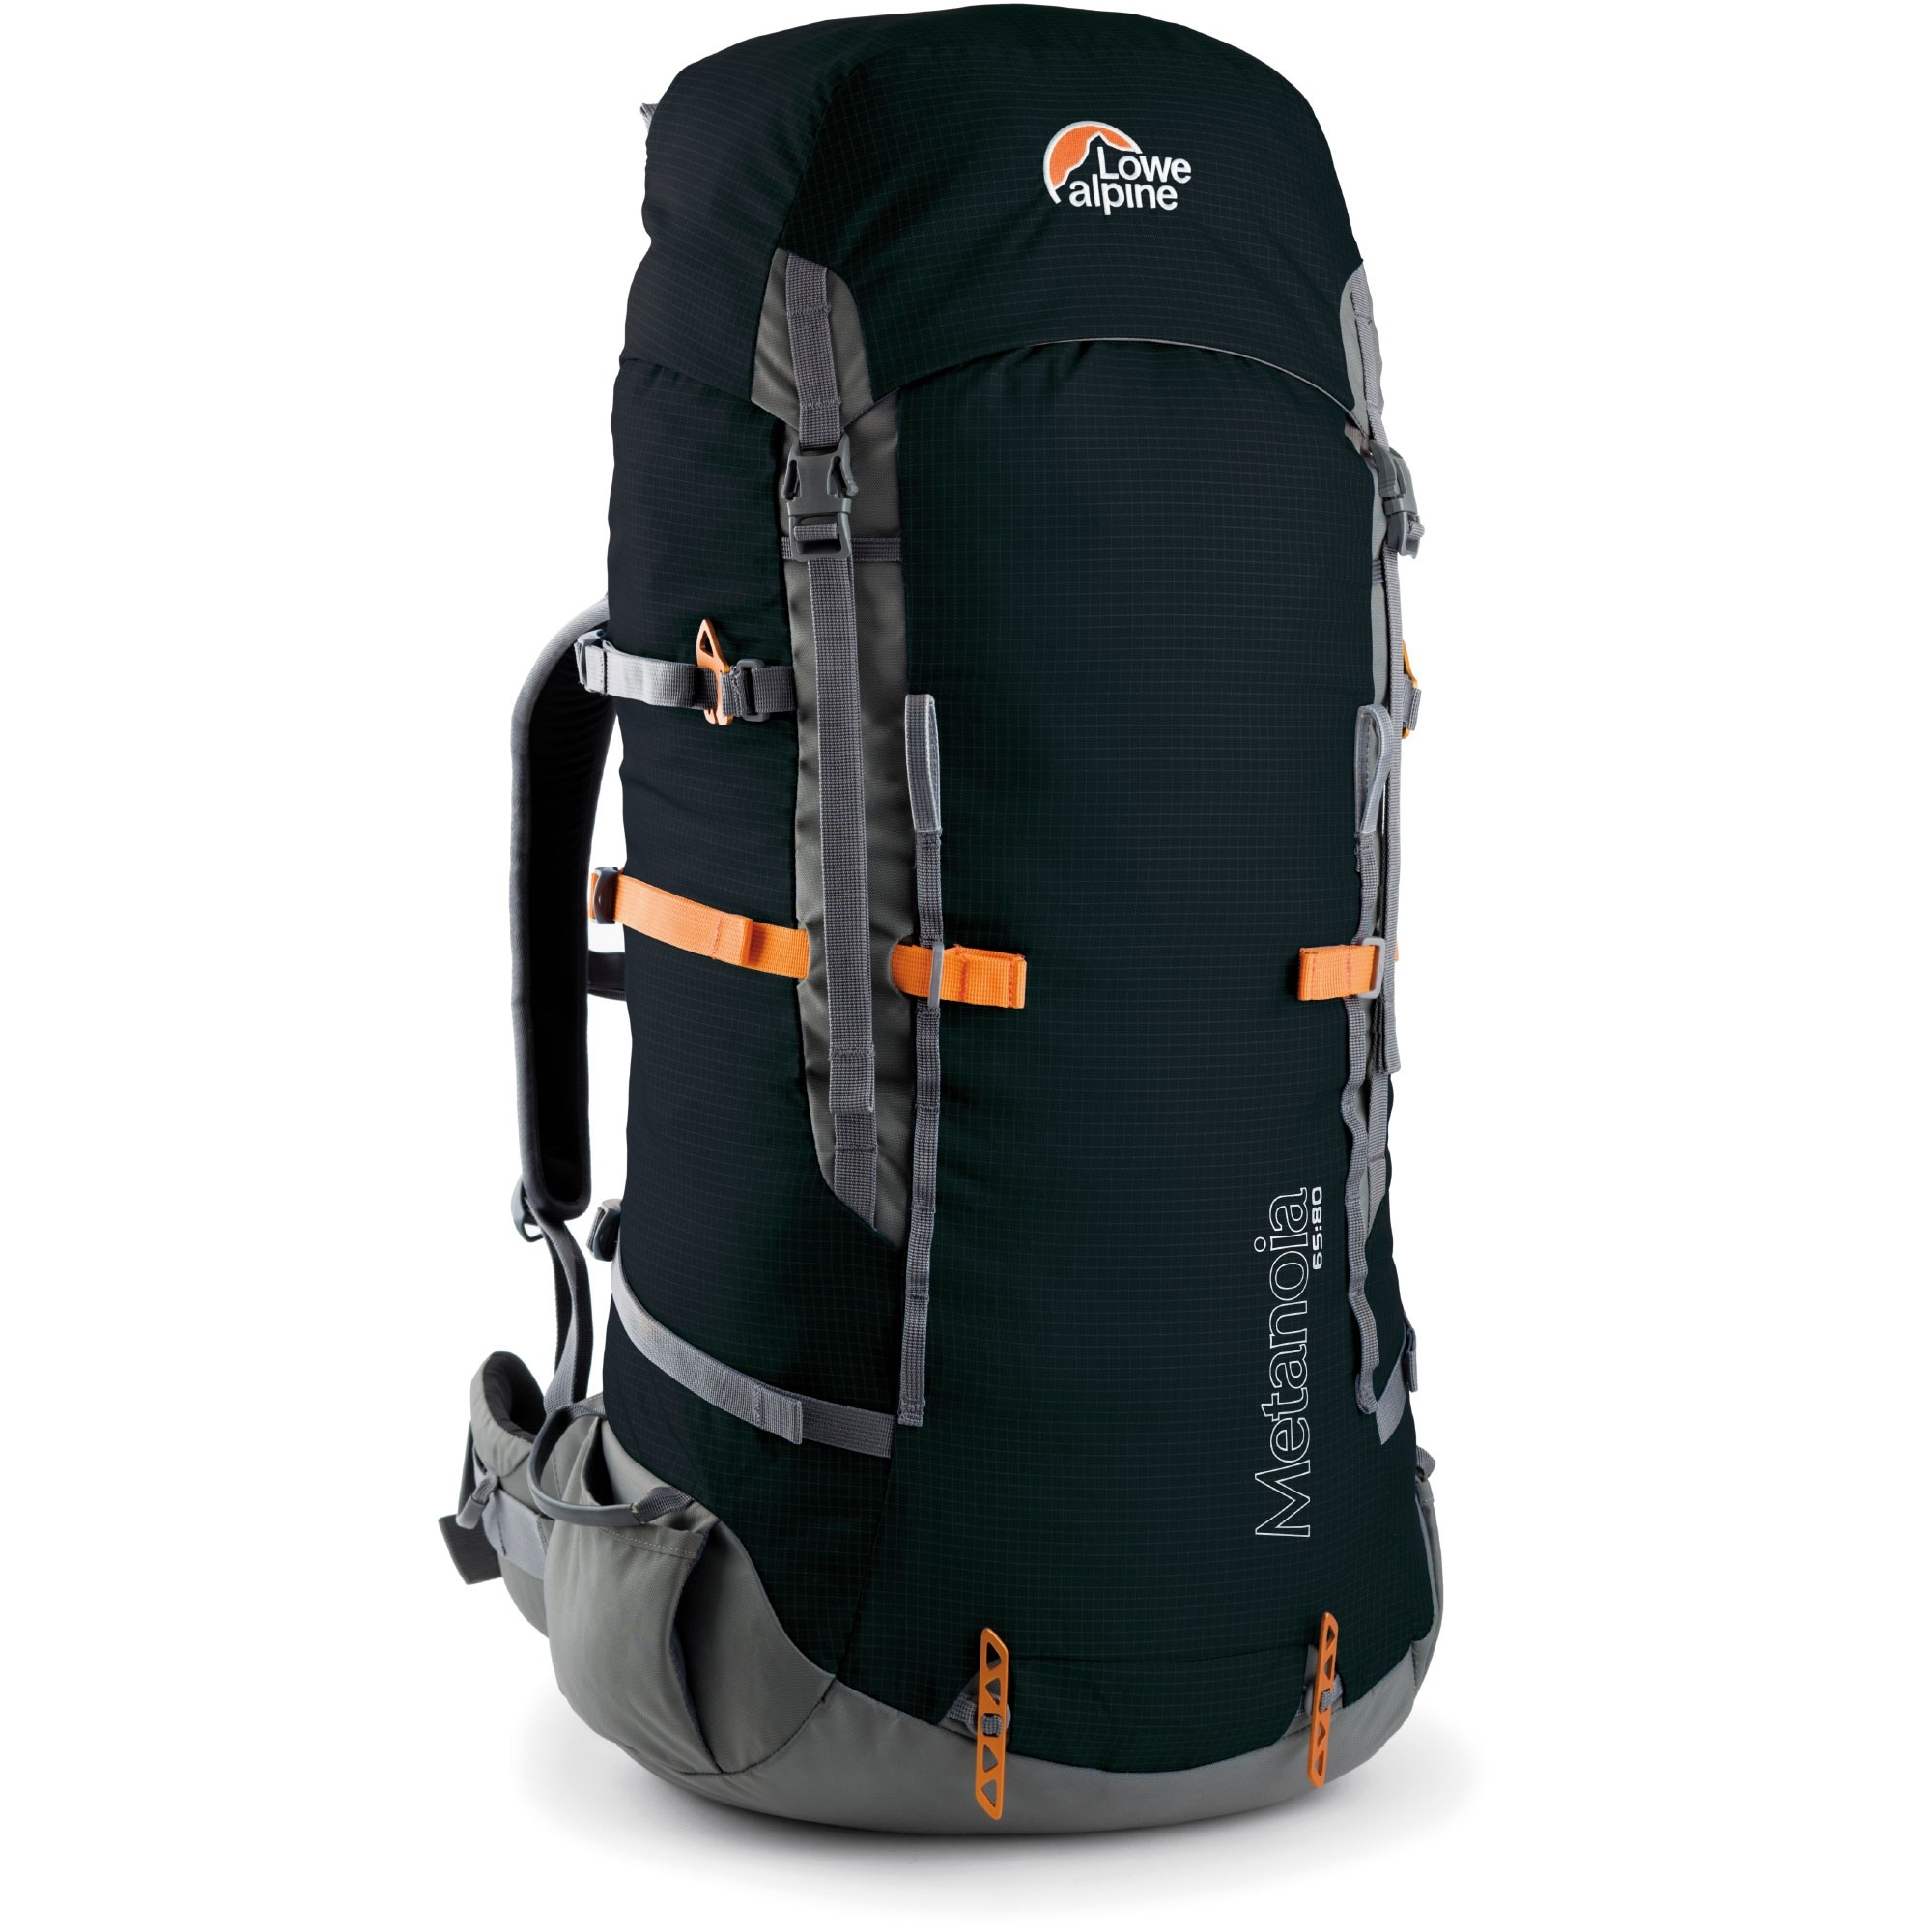 Lowe Alpine Metanoia 65:80 Litre Expedition Rucksack - Black